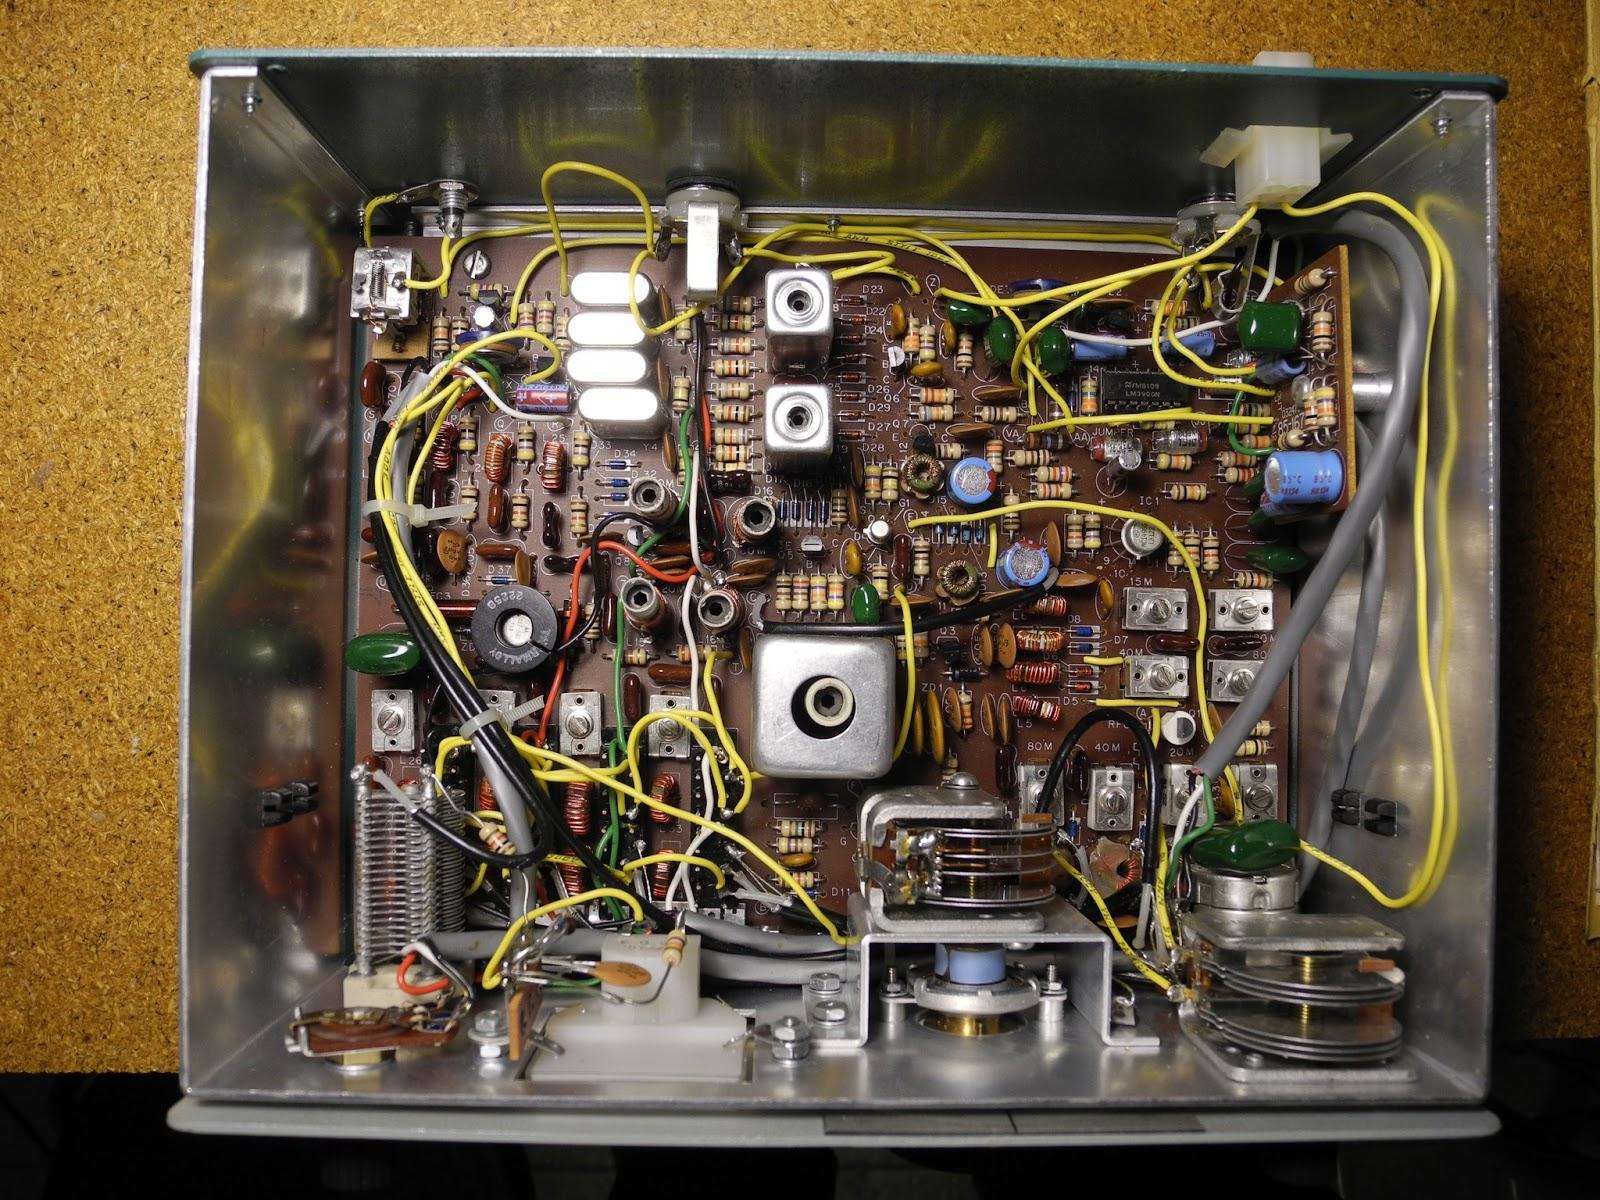 Heathkit power supply hwa-7-1 for heathkit hw-8 cw qrp transceiver.